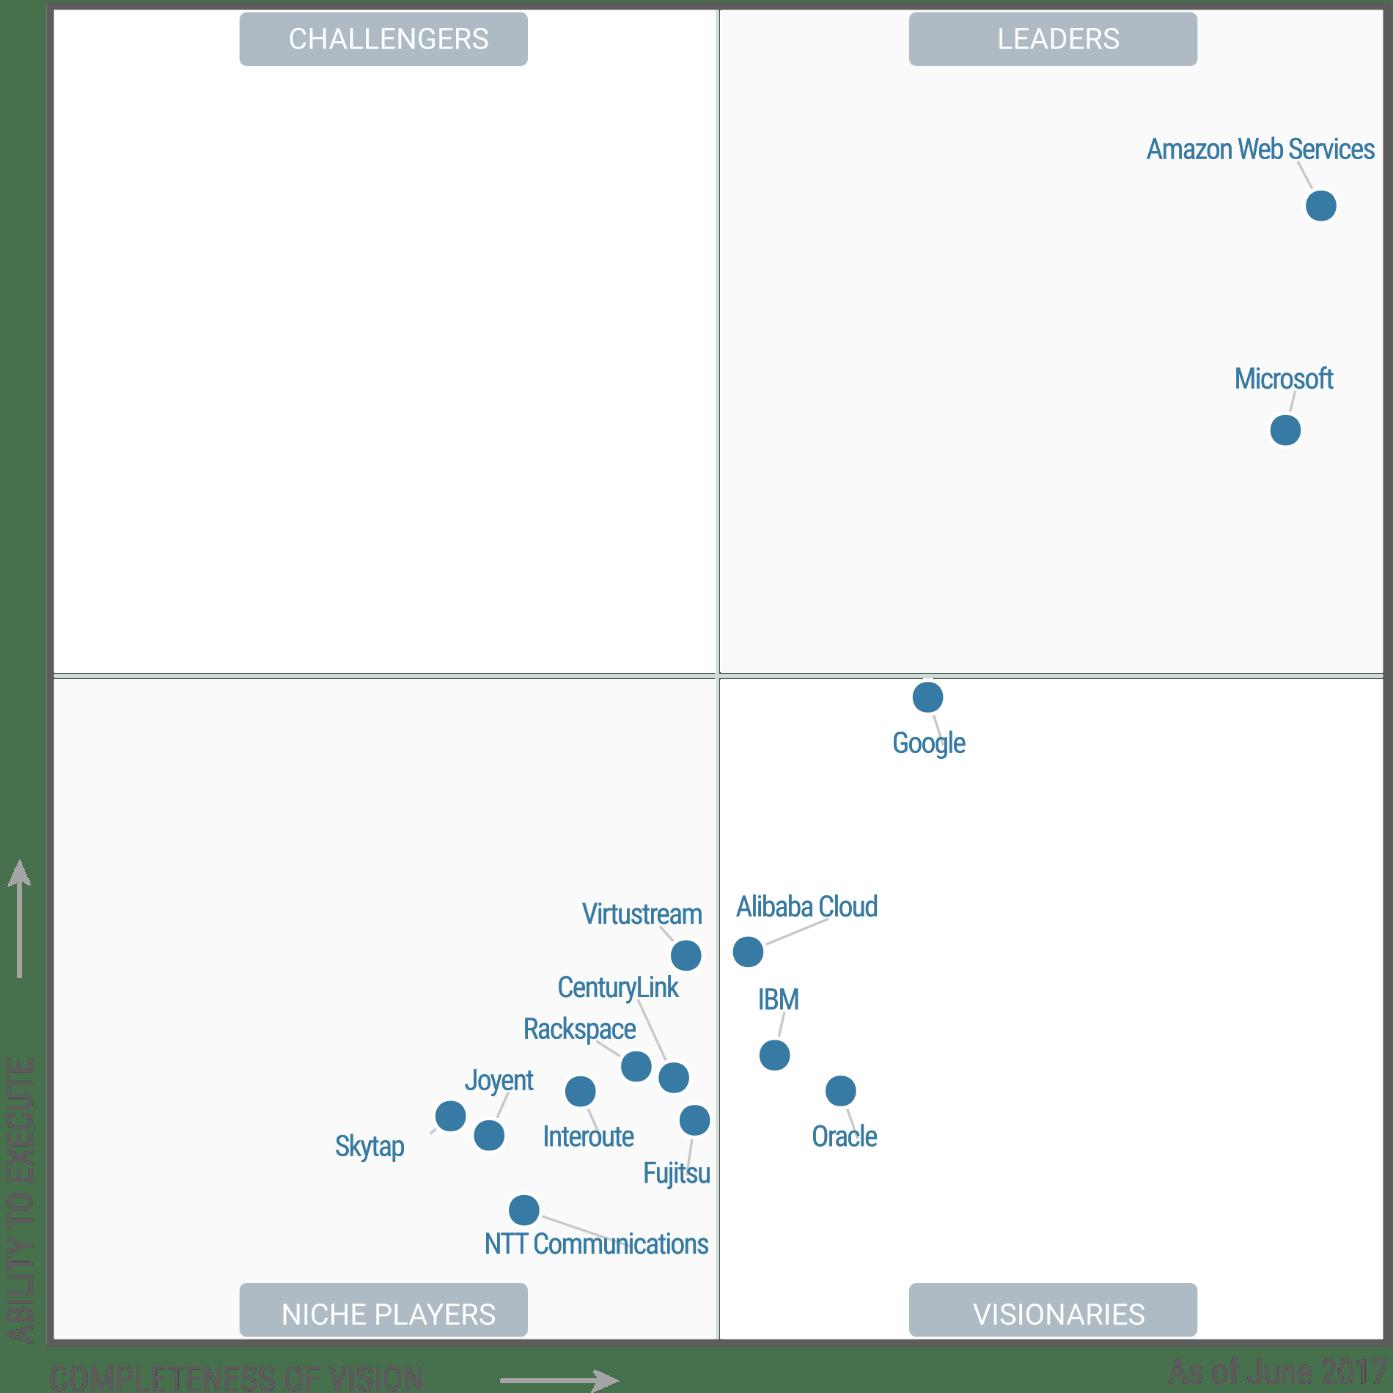 Gartner Magic Quadrant for Cloud Infrastructure as a ...